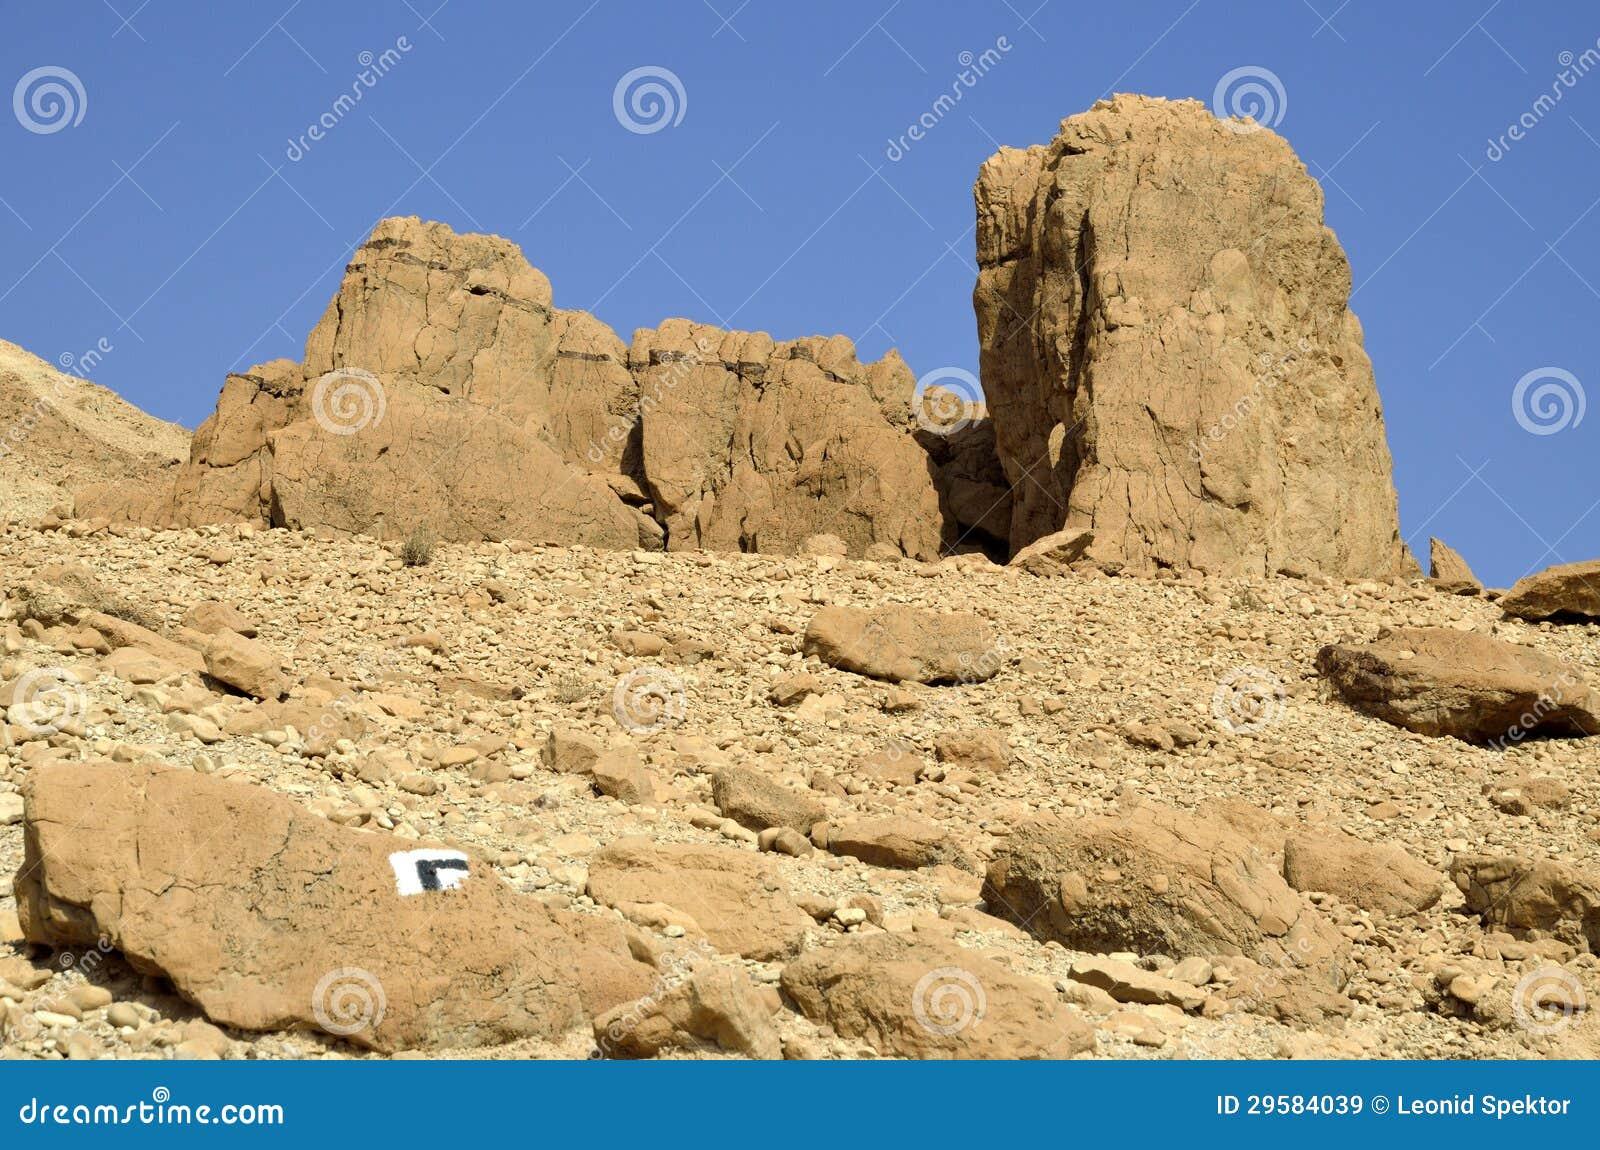 Judea沙漠岩石。